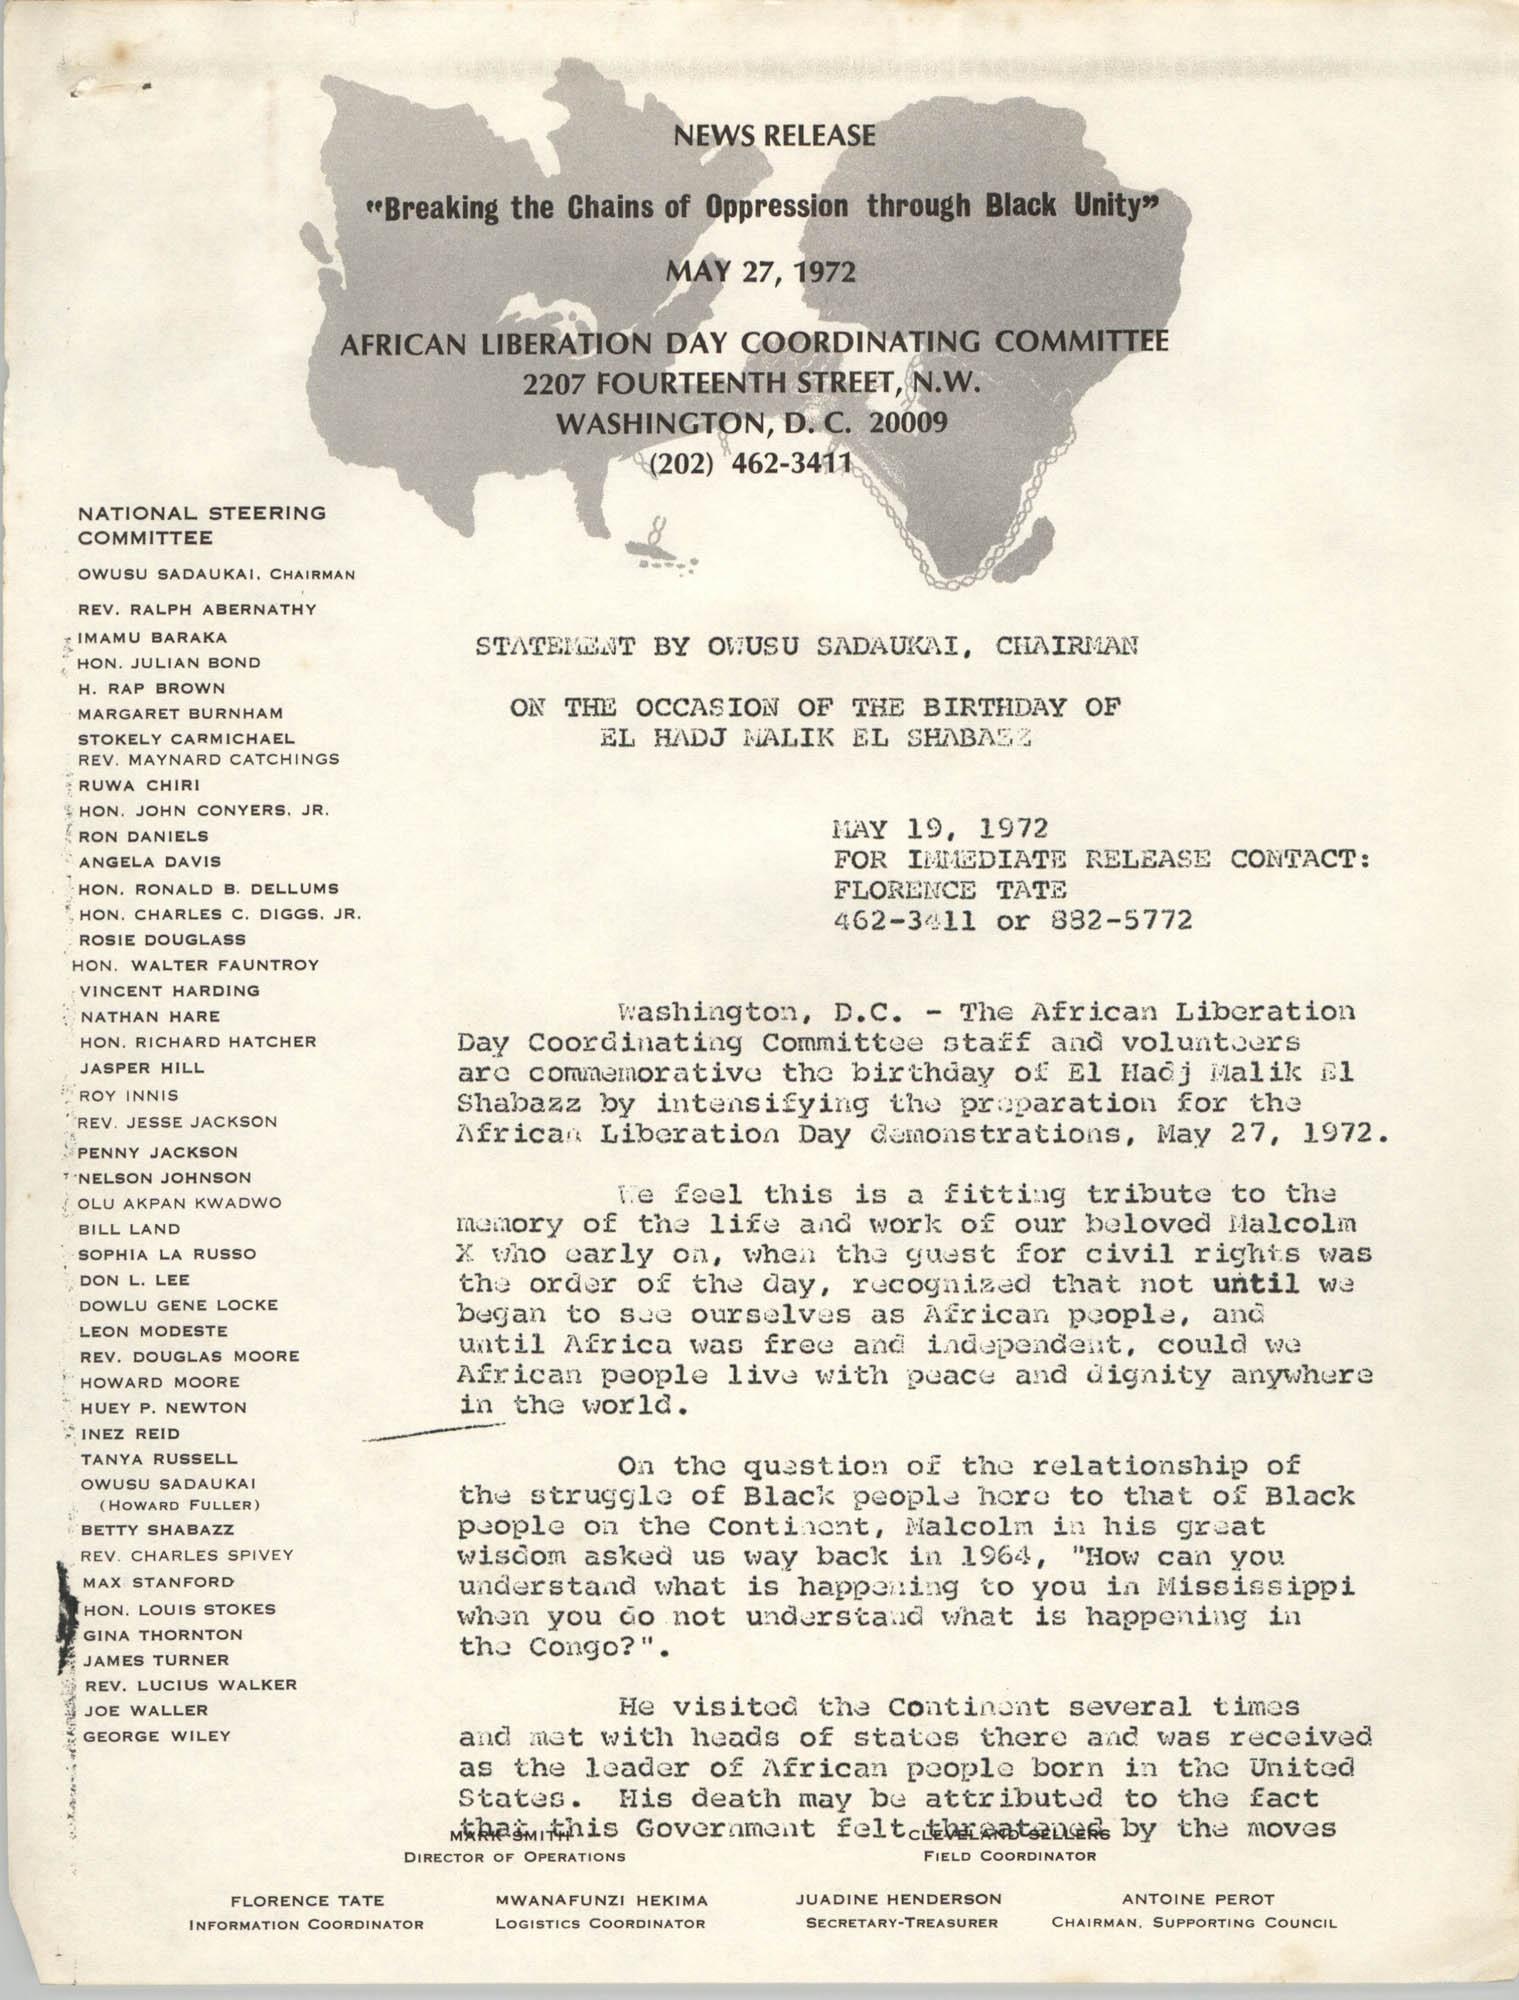 Press Release On the Occasion of the Birthday of El Hadj Malik El Shabazz, May 27, 1972